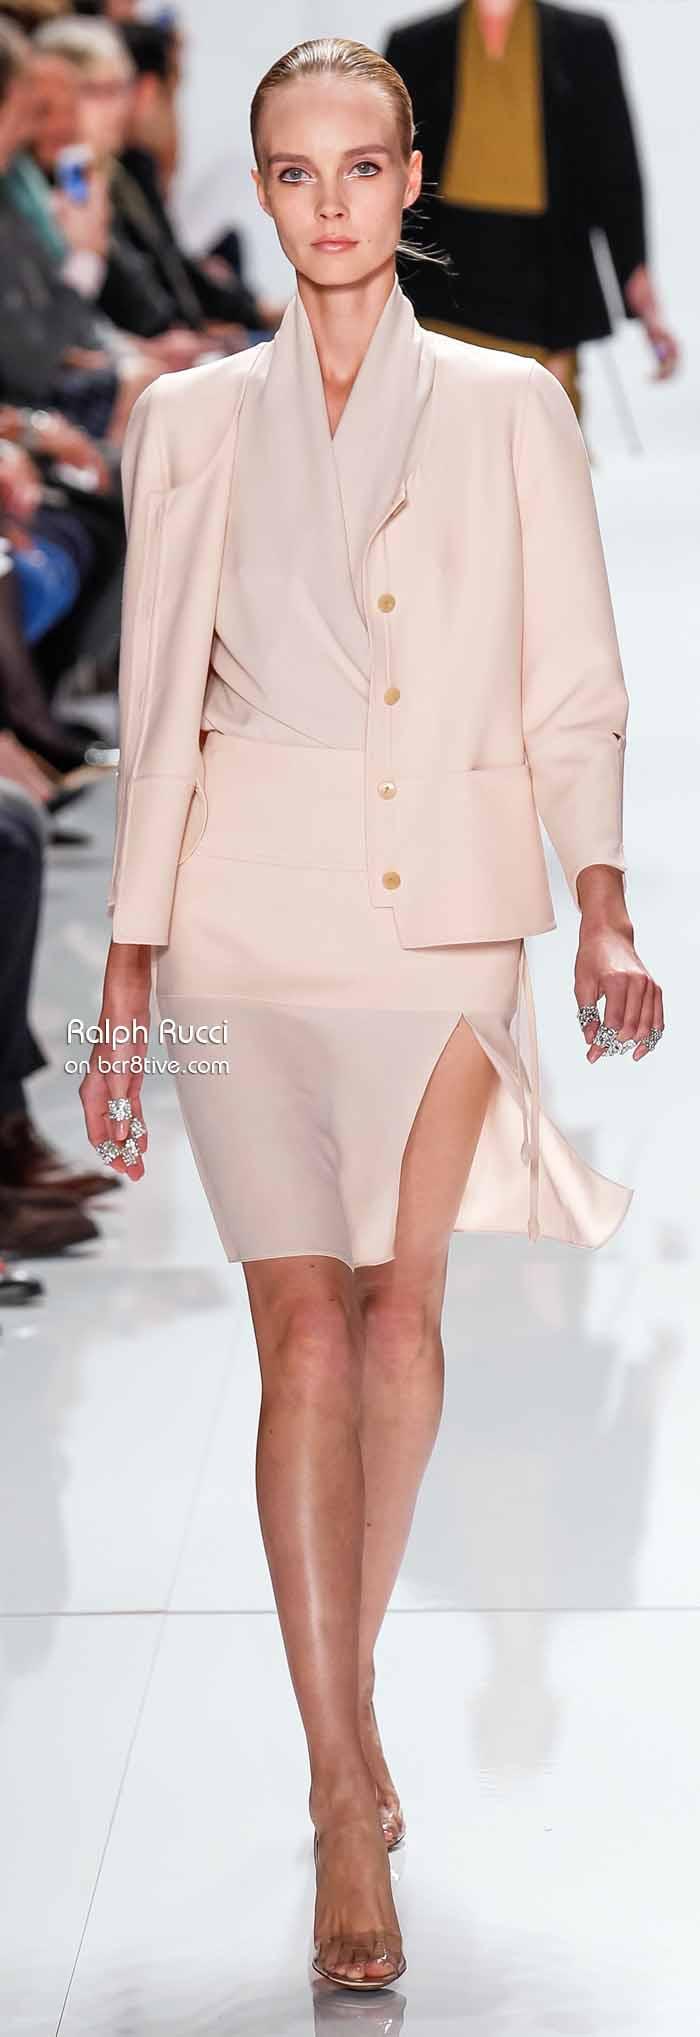 Ralph Rucci Spring 2014 #NYFW